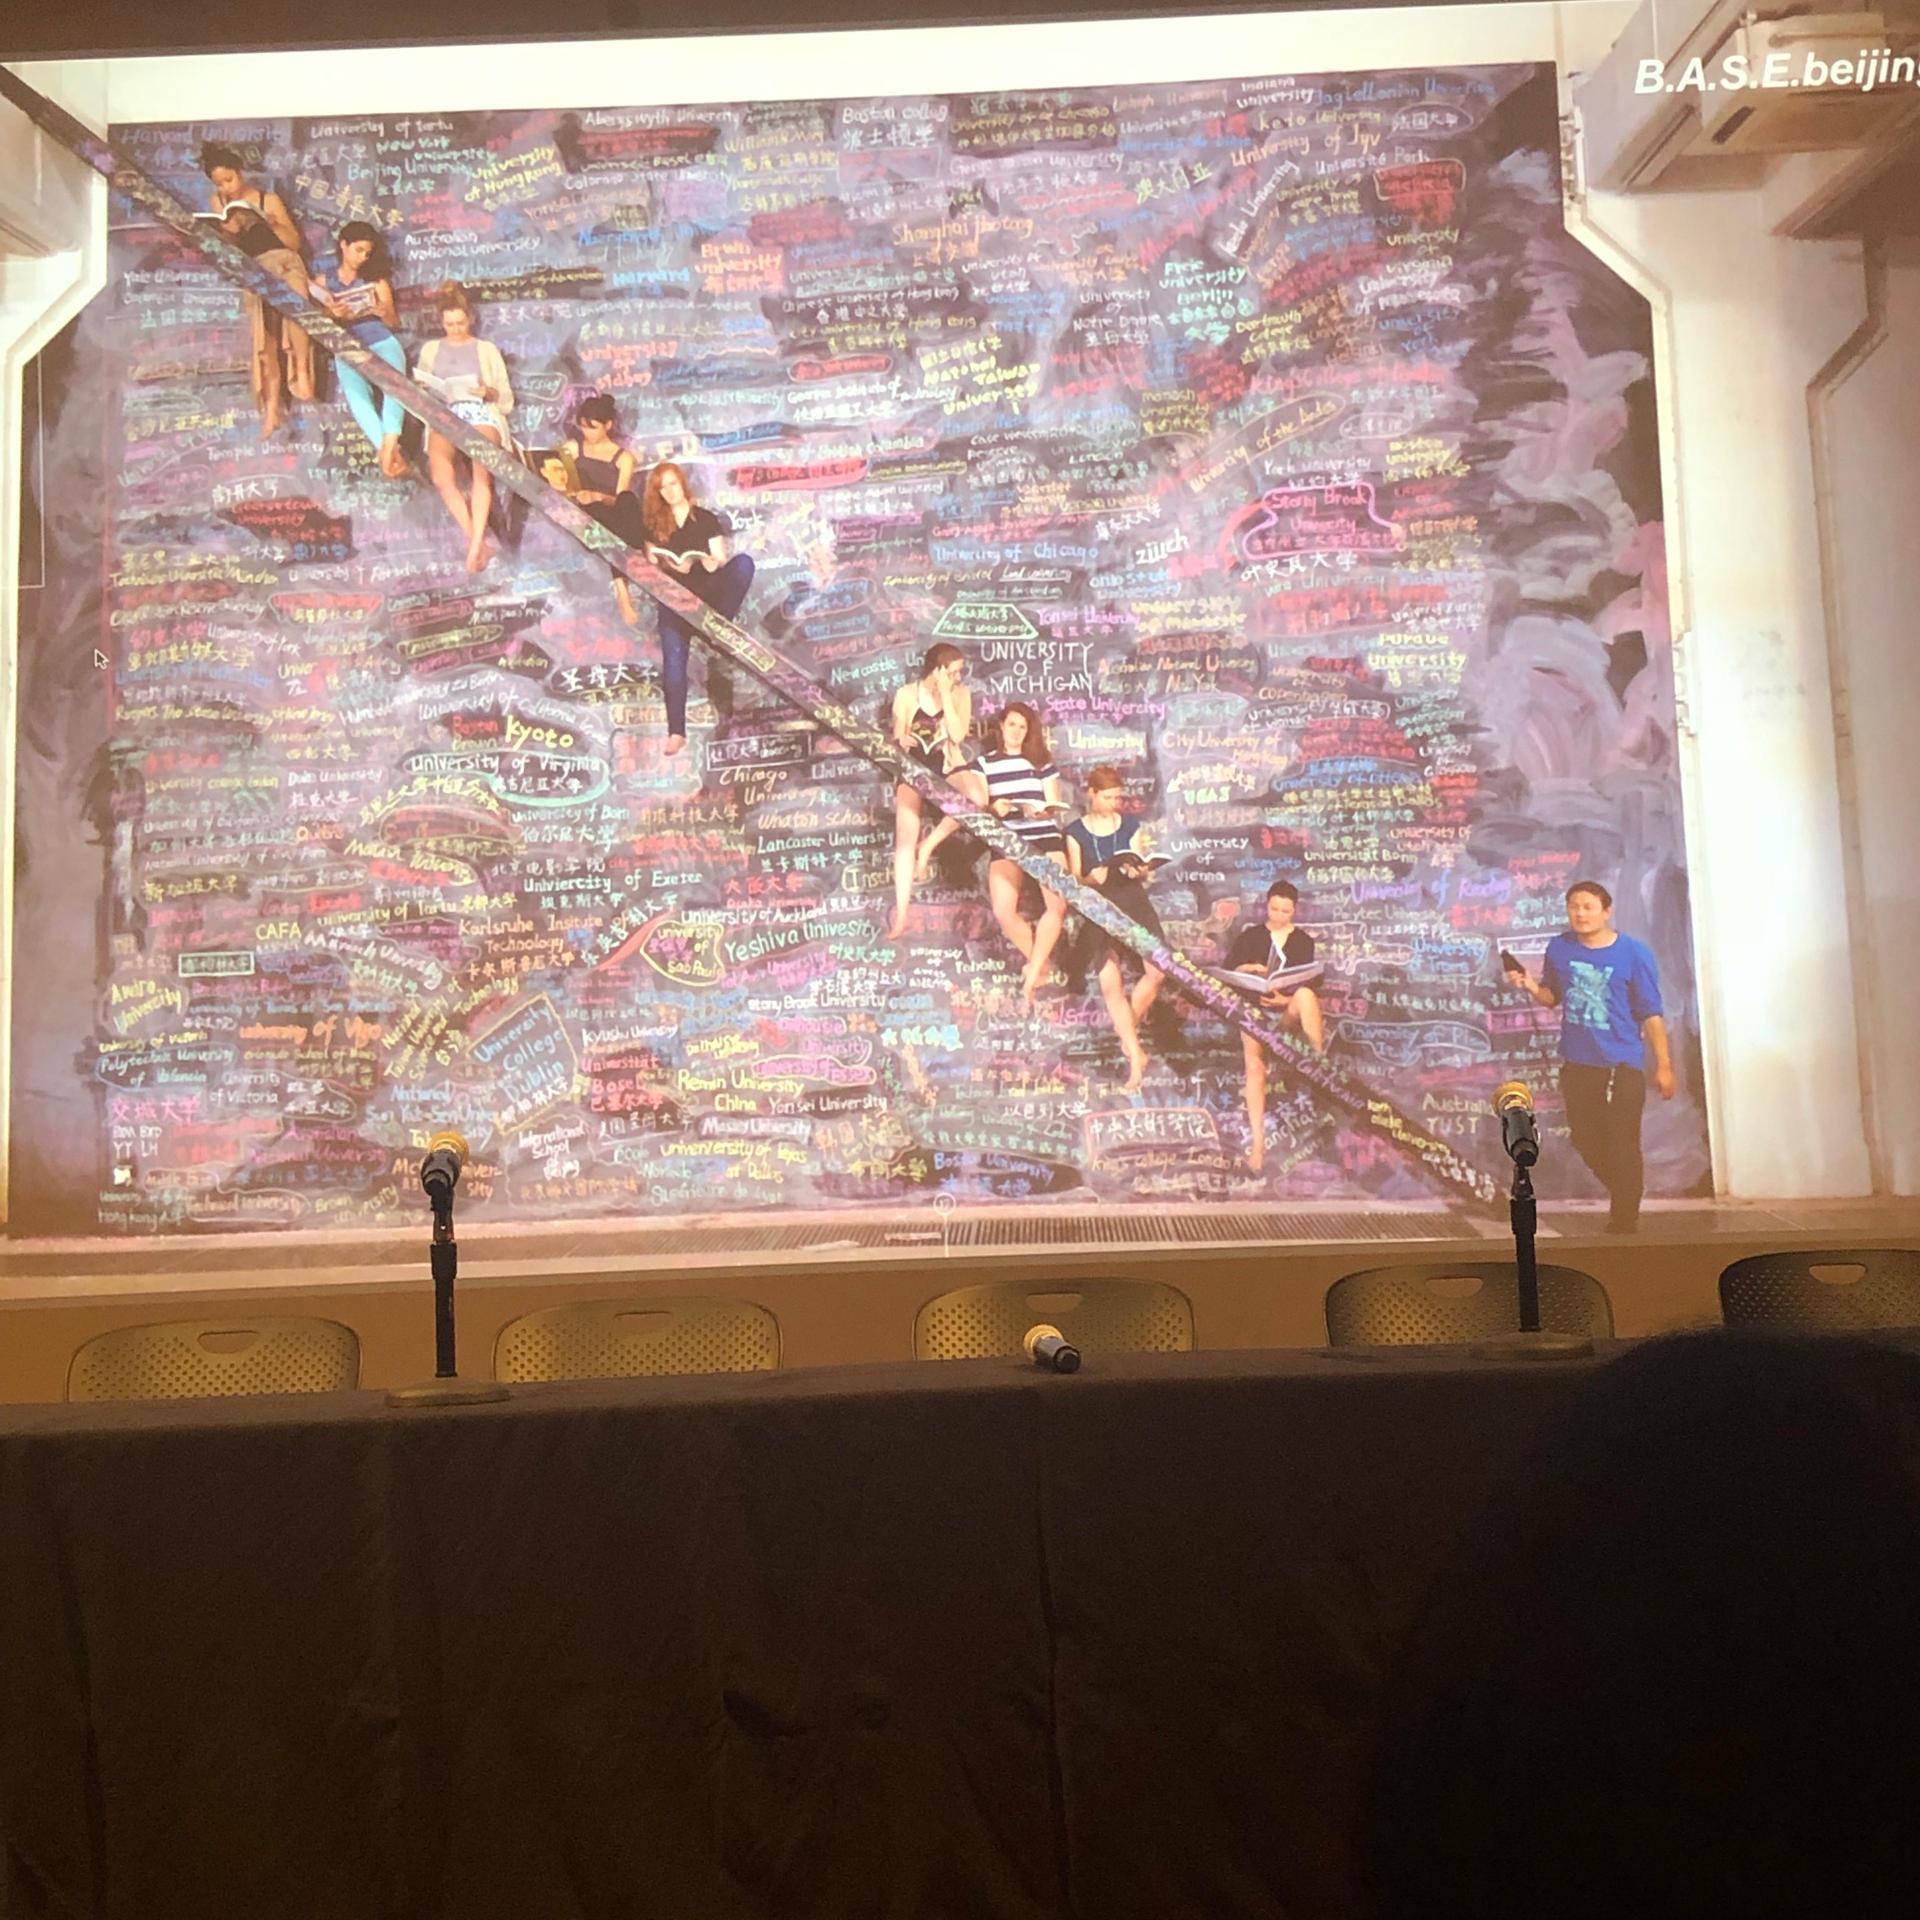 Chinese Contemporary Art Symposium